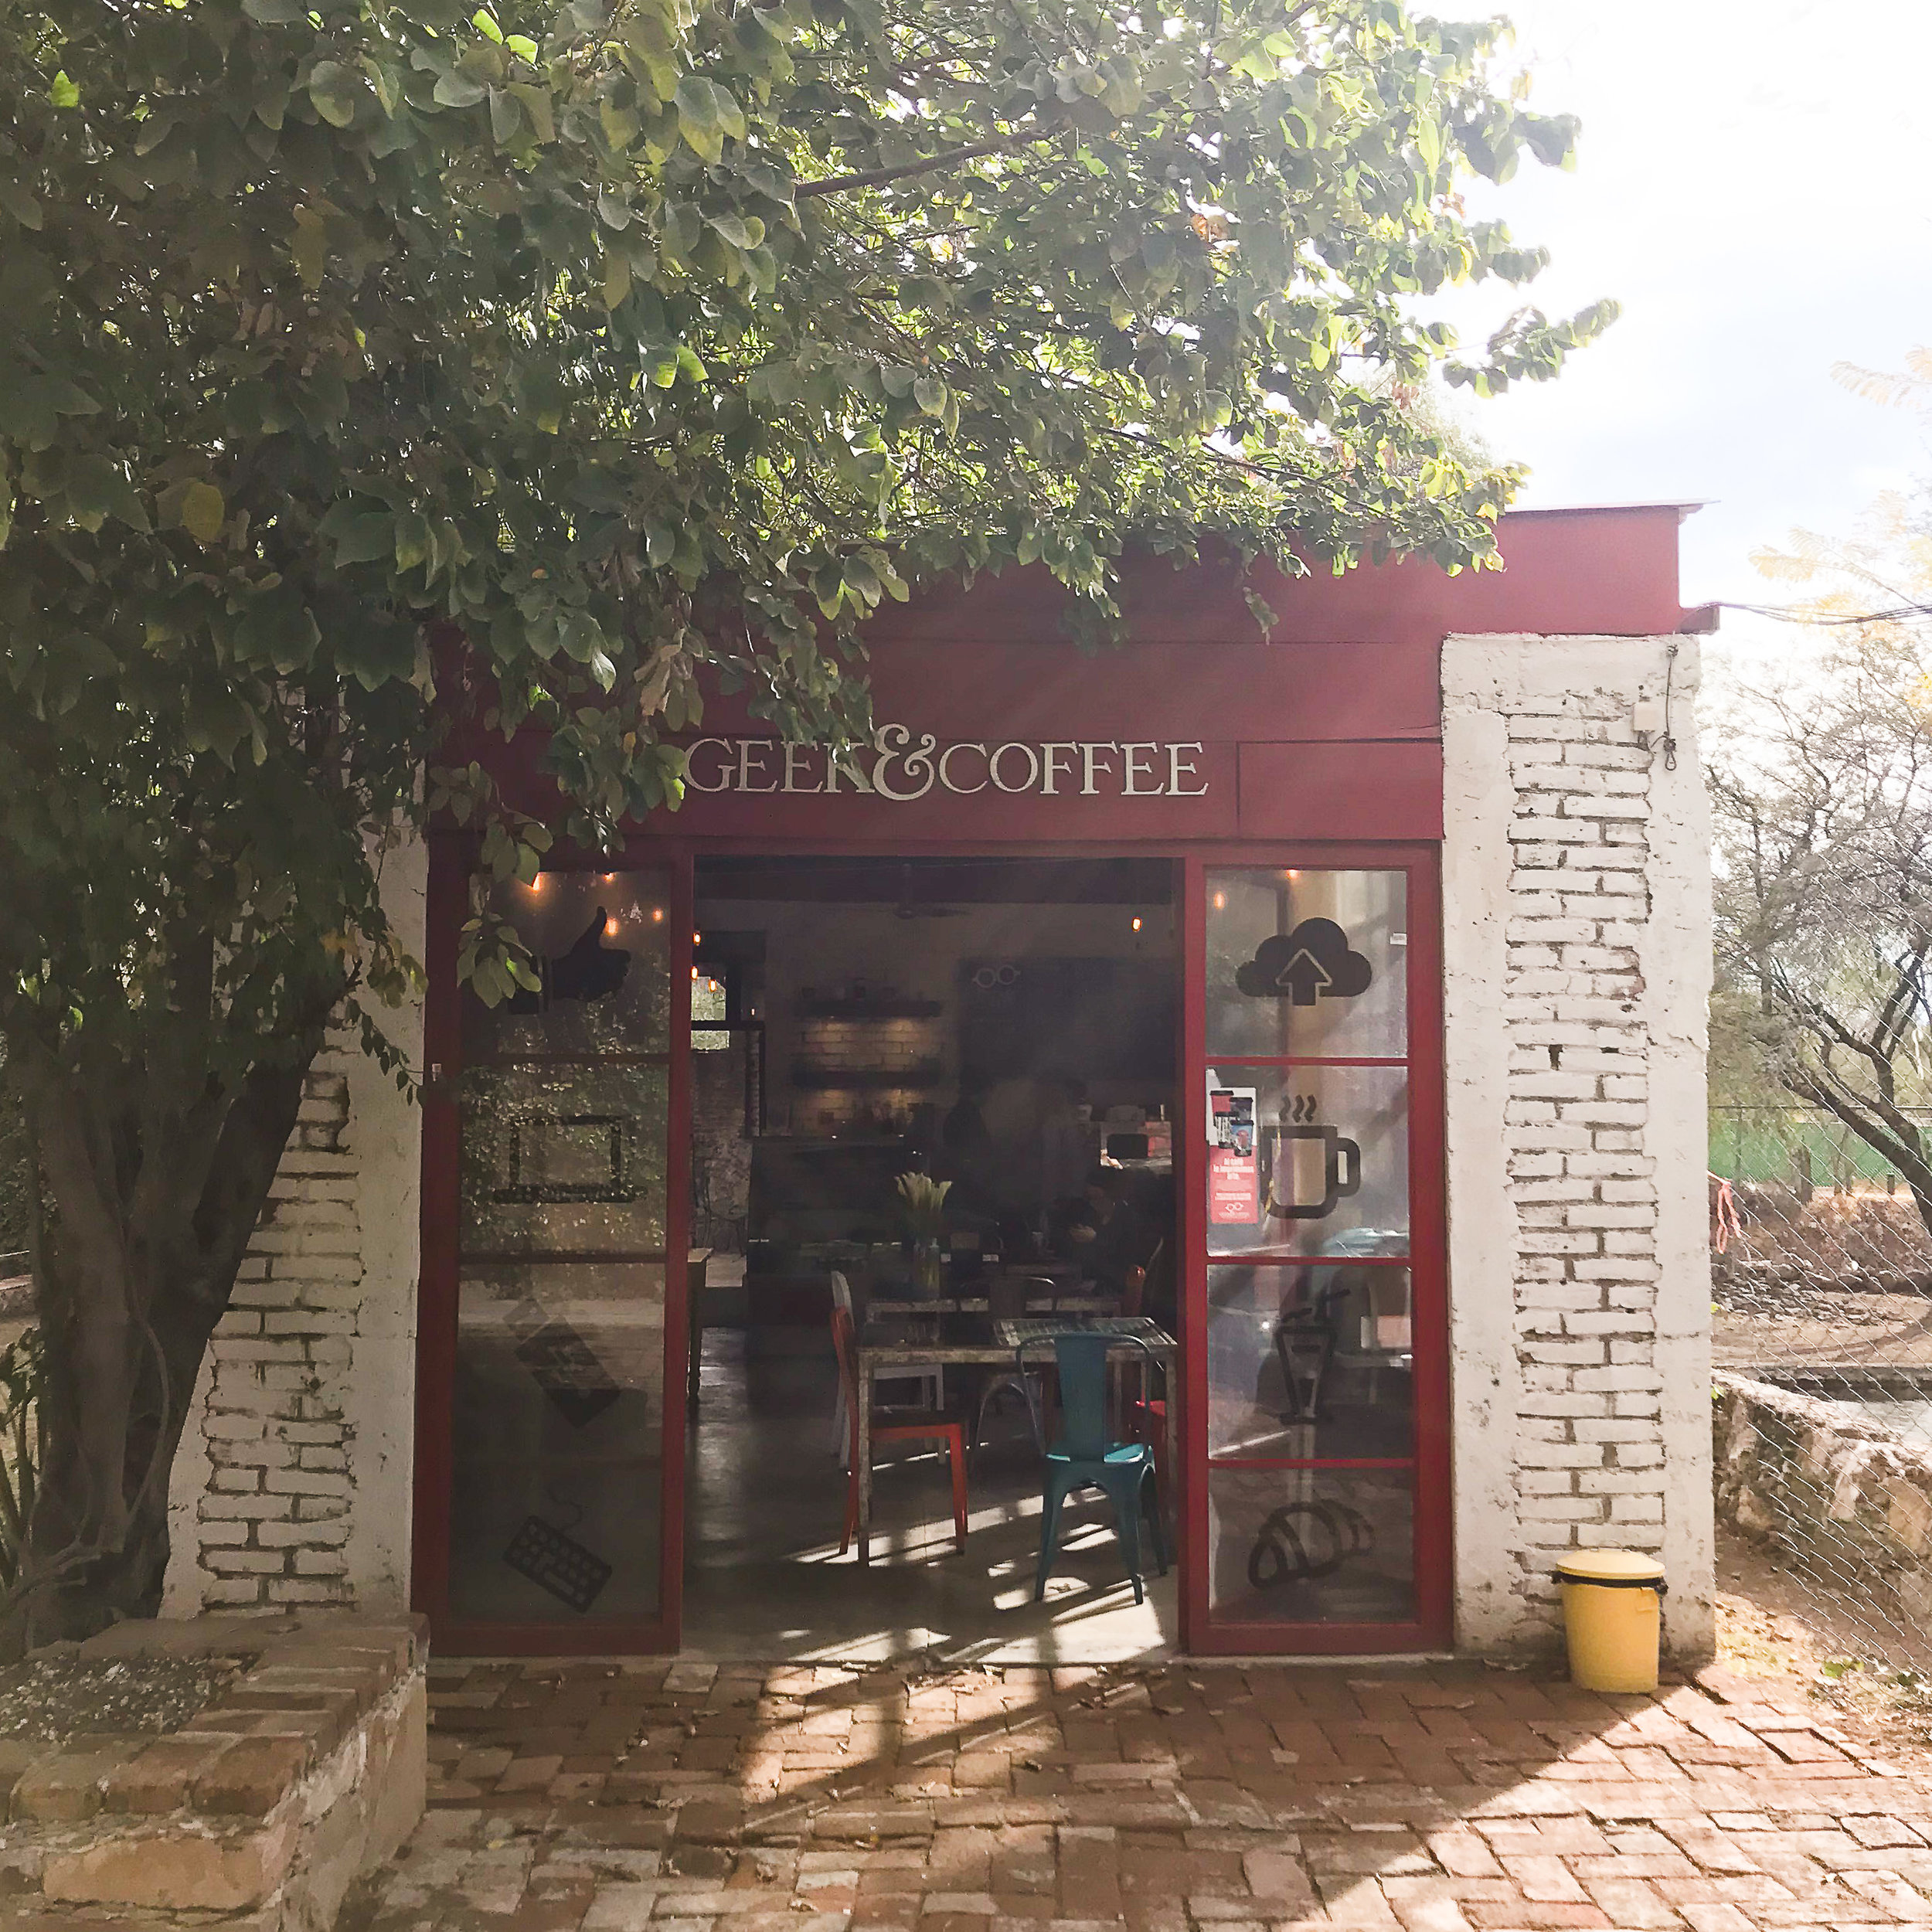 mexican-food-san-miguel-de-allende-restuarants-coffee-cafes-24.jpg